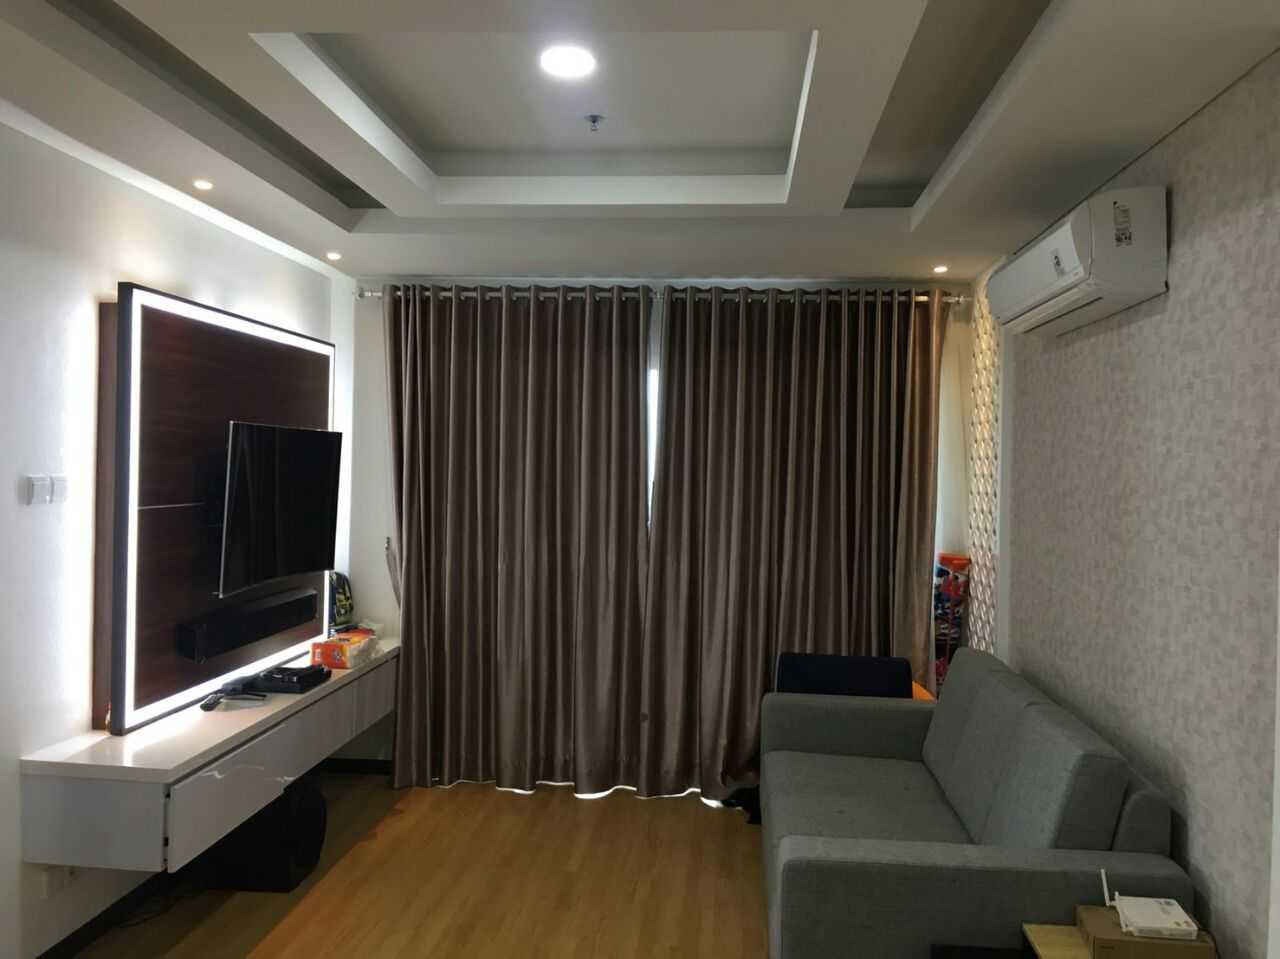 Ceka Arsitektur Interior Greenbay Condominium 20, Jl. Pluit Karang Ayu Barat No.b1, Rw.2, Pluit, Kec. Penjaringan, Kota Jkt Utara, Daerah Khusus Ibukota Jakarta 14450, Indonesia 20, Jl. Pluit Karang Ayu Barat No.b1, Rw.2, Pluit, Kec. Penjaringan, Kota Jkt Utara, Daerah Khusus Ibukota Jakarta 14450, Indonesia Ceka-Arsitektur-Interior-Greenbay-Condominium  86725